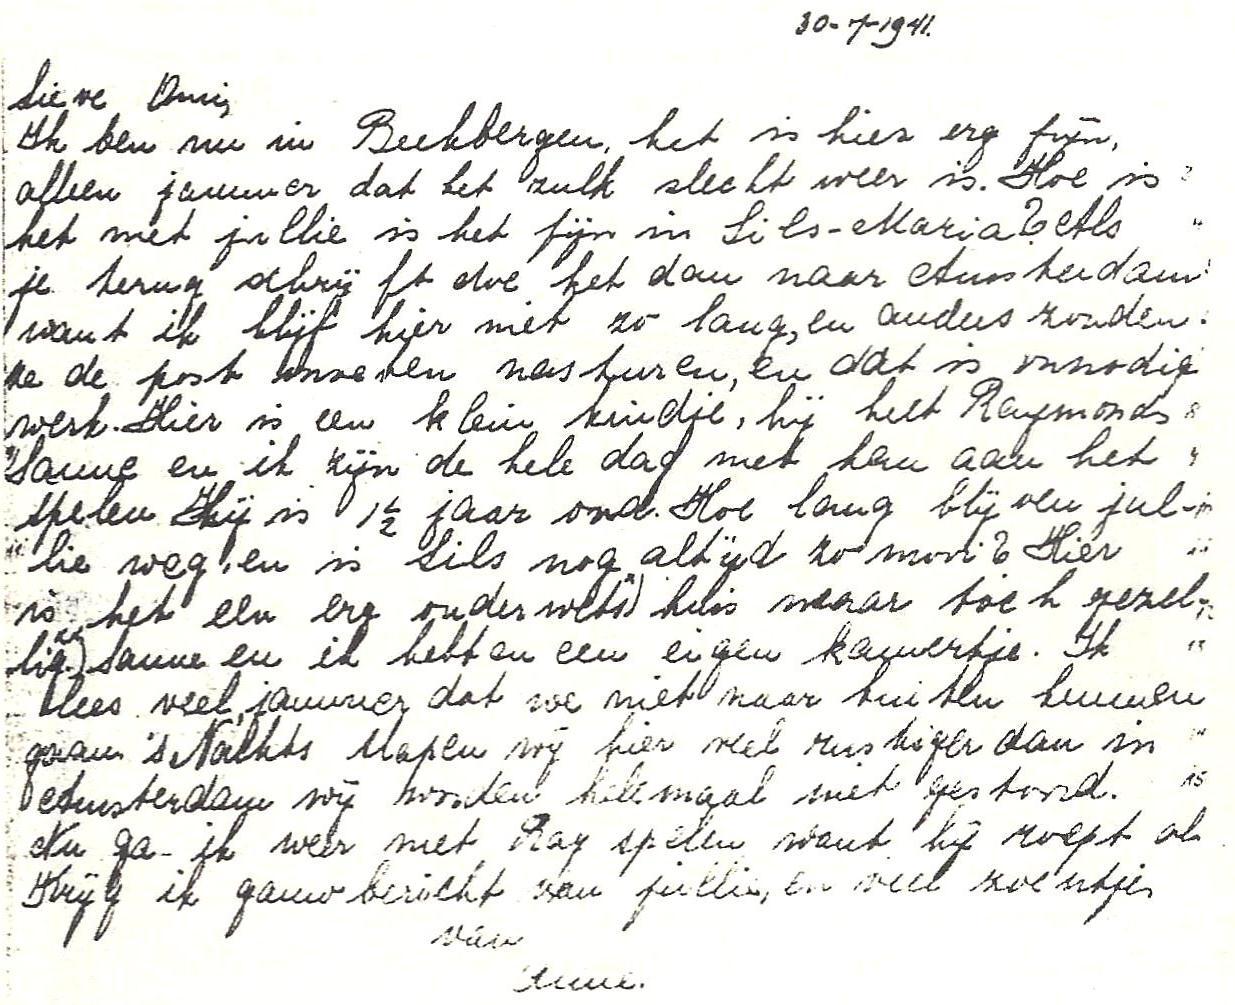 Anne Frank's Handwriting